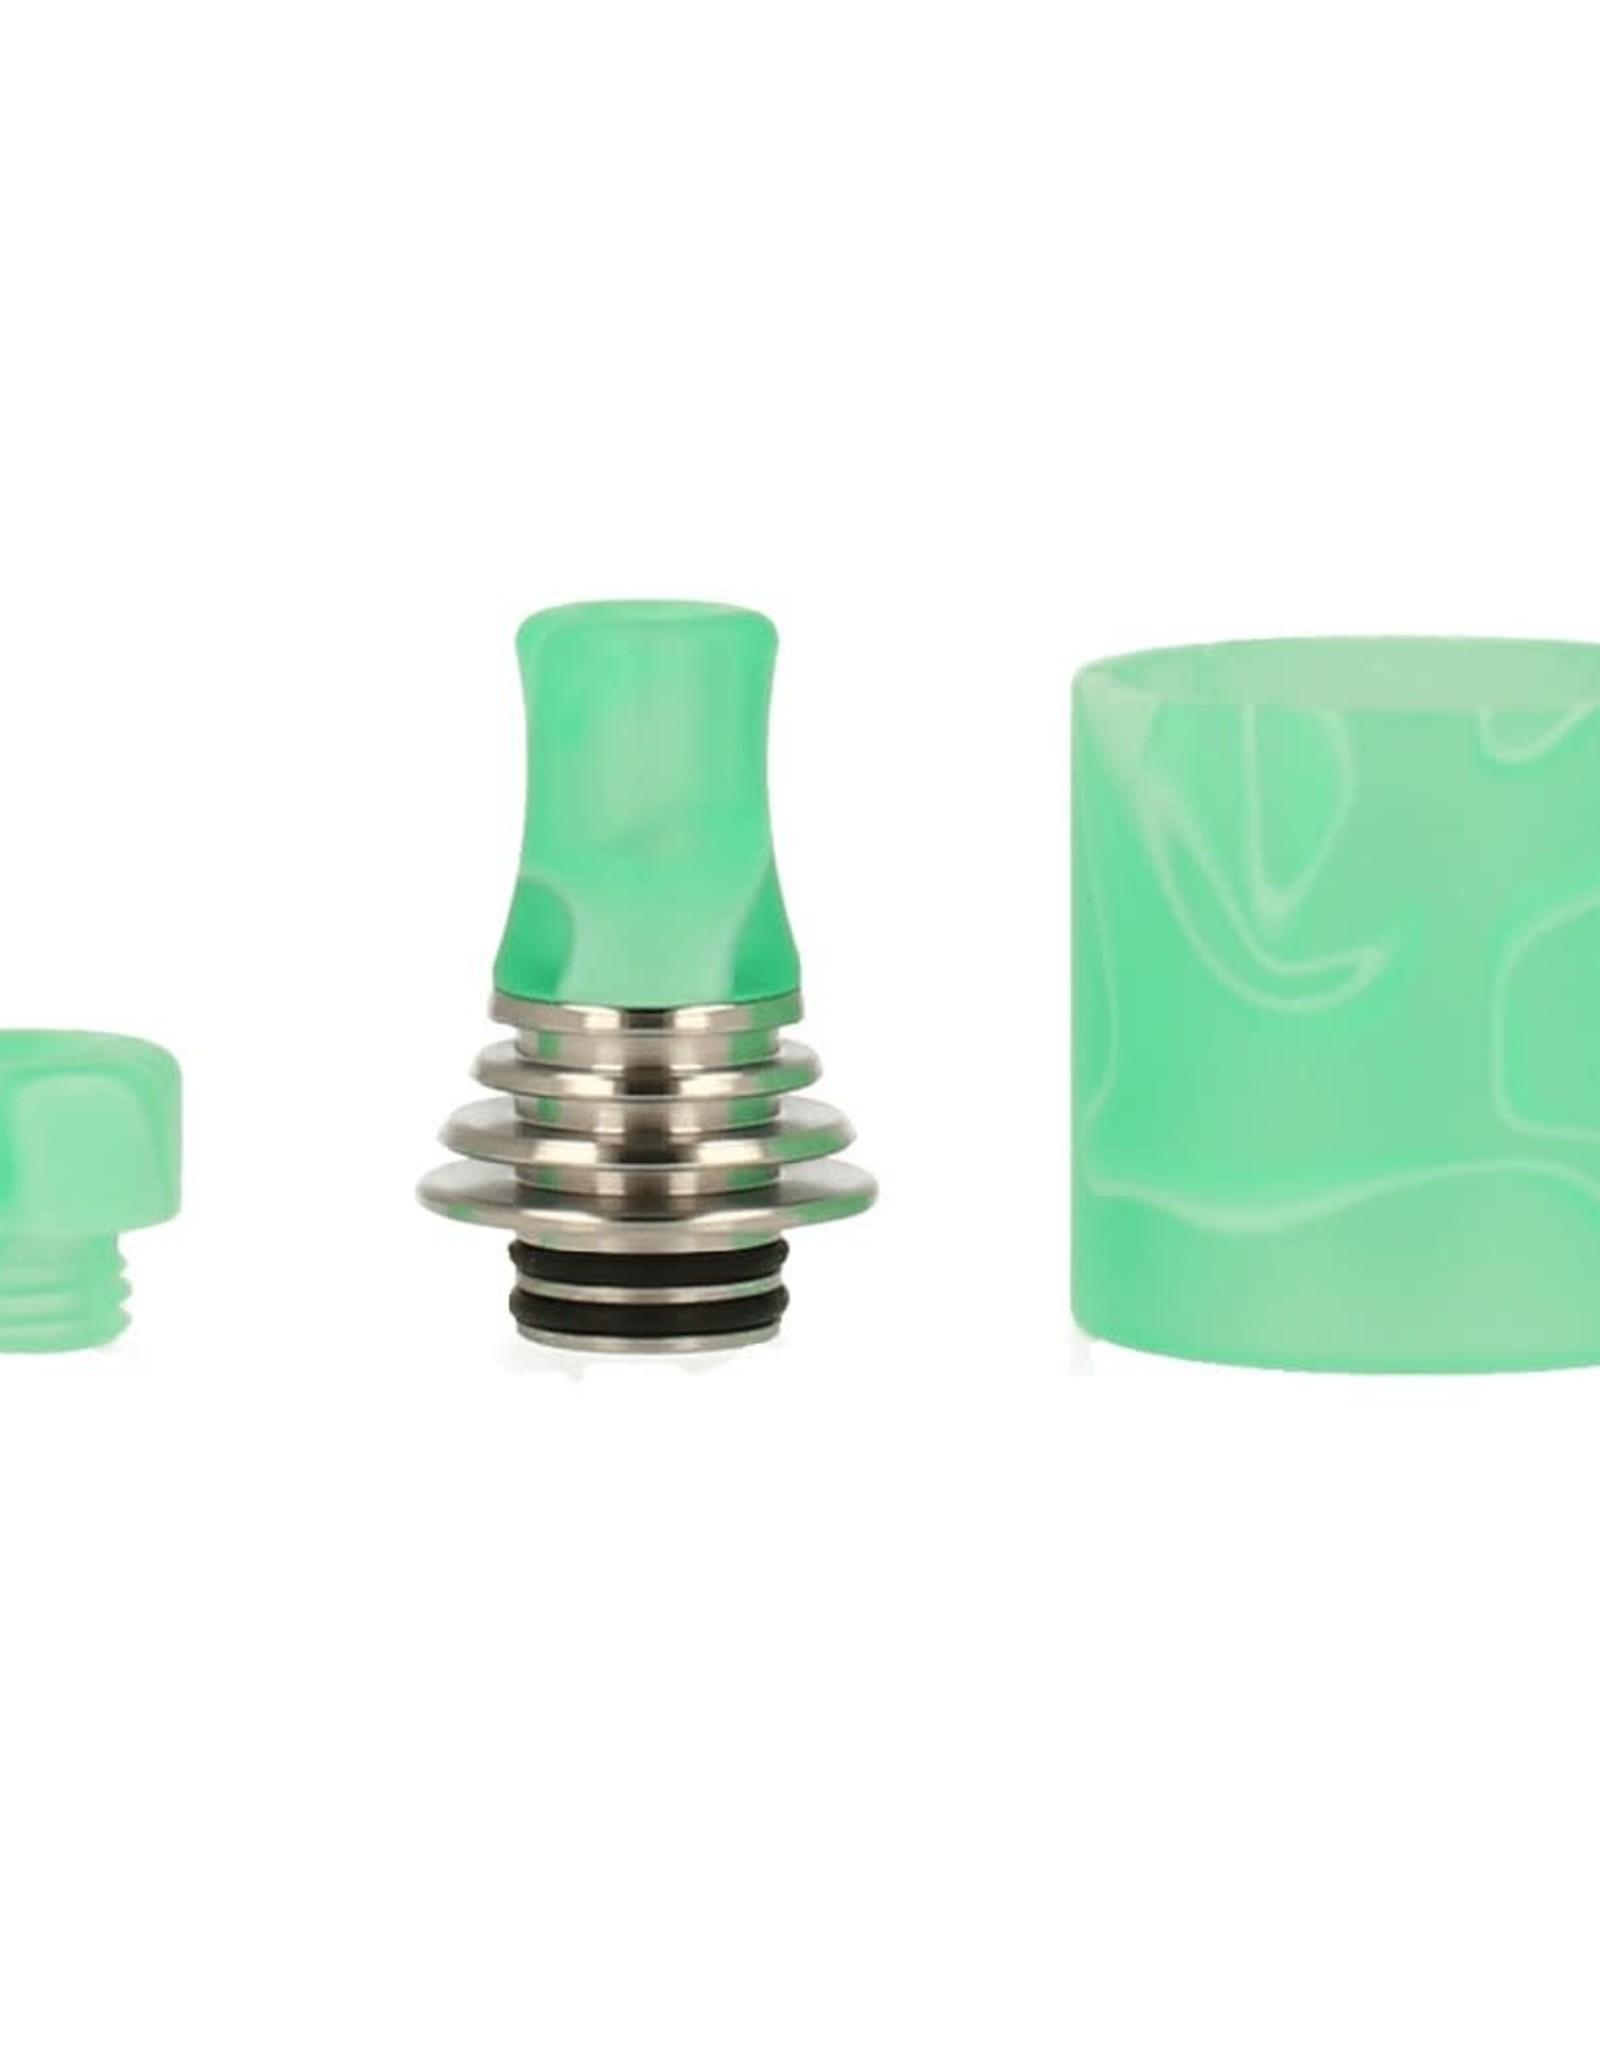 VapeFly Vapefly Brunhilde MTL RDTA  Resin DripTip Set & Glas